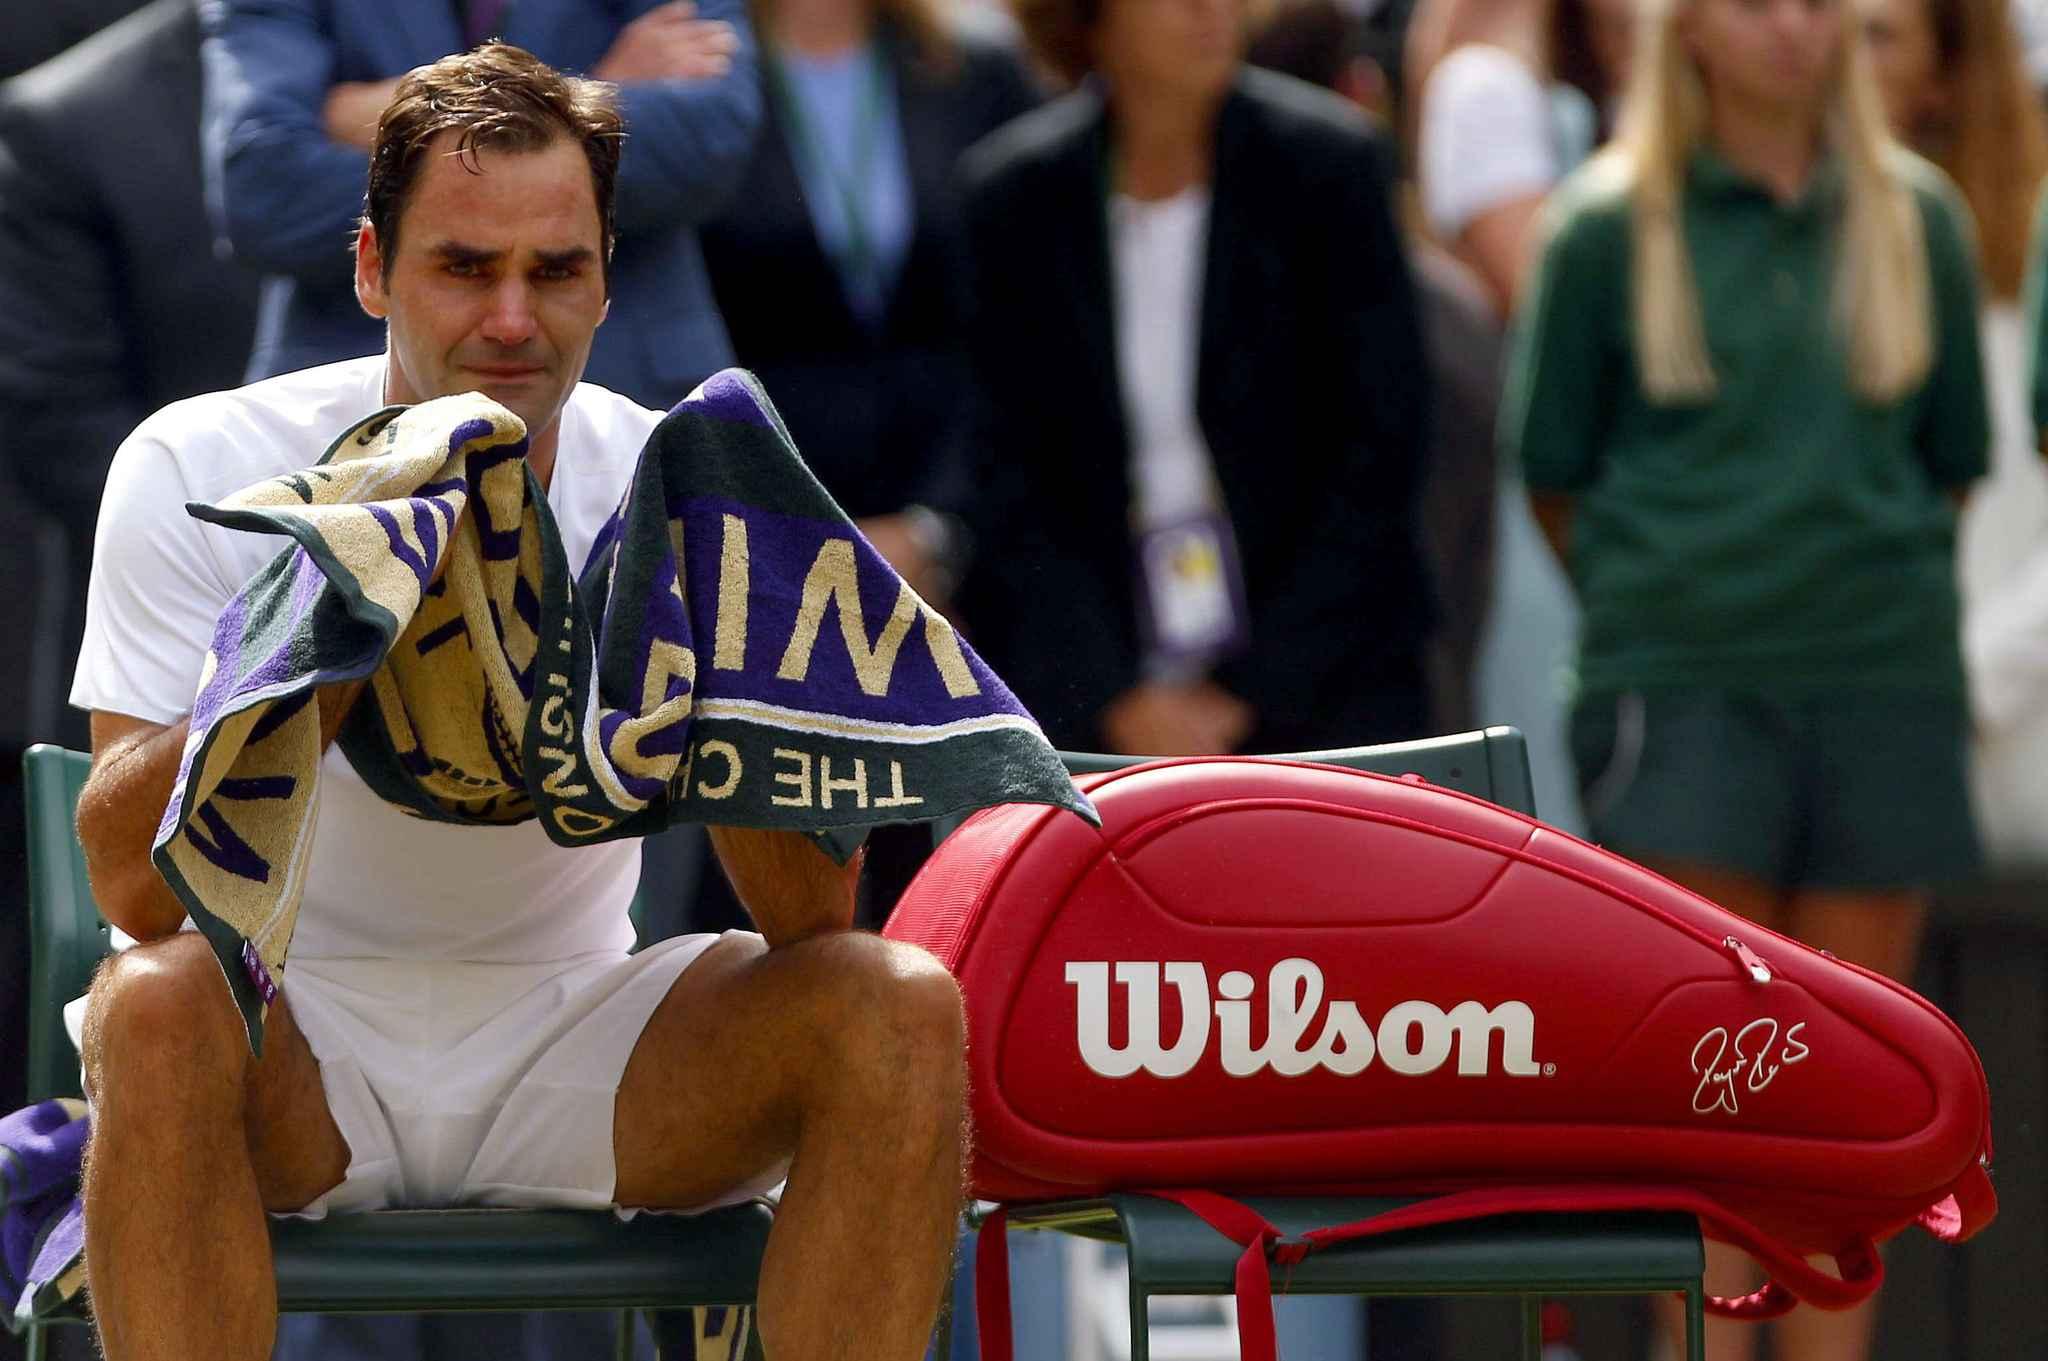 Mandatory Credit: Photo by Ella Ling/BPI/REX/Shutterstock (8962346hu) Roger Federer of Switzerland cries following the Men's Final Wimbledon 2017, Day 13, All England Lawn Tennis Club, London UK, 16 July 2017